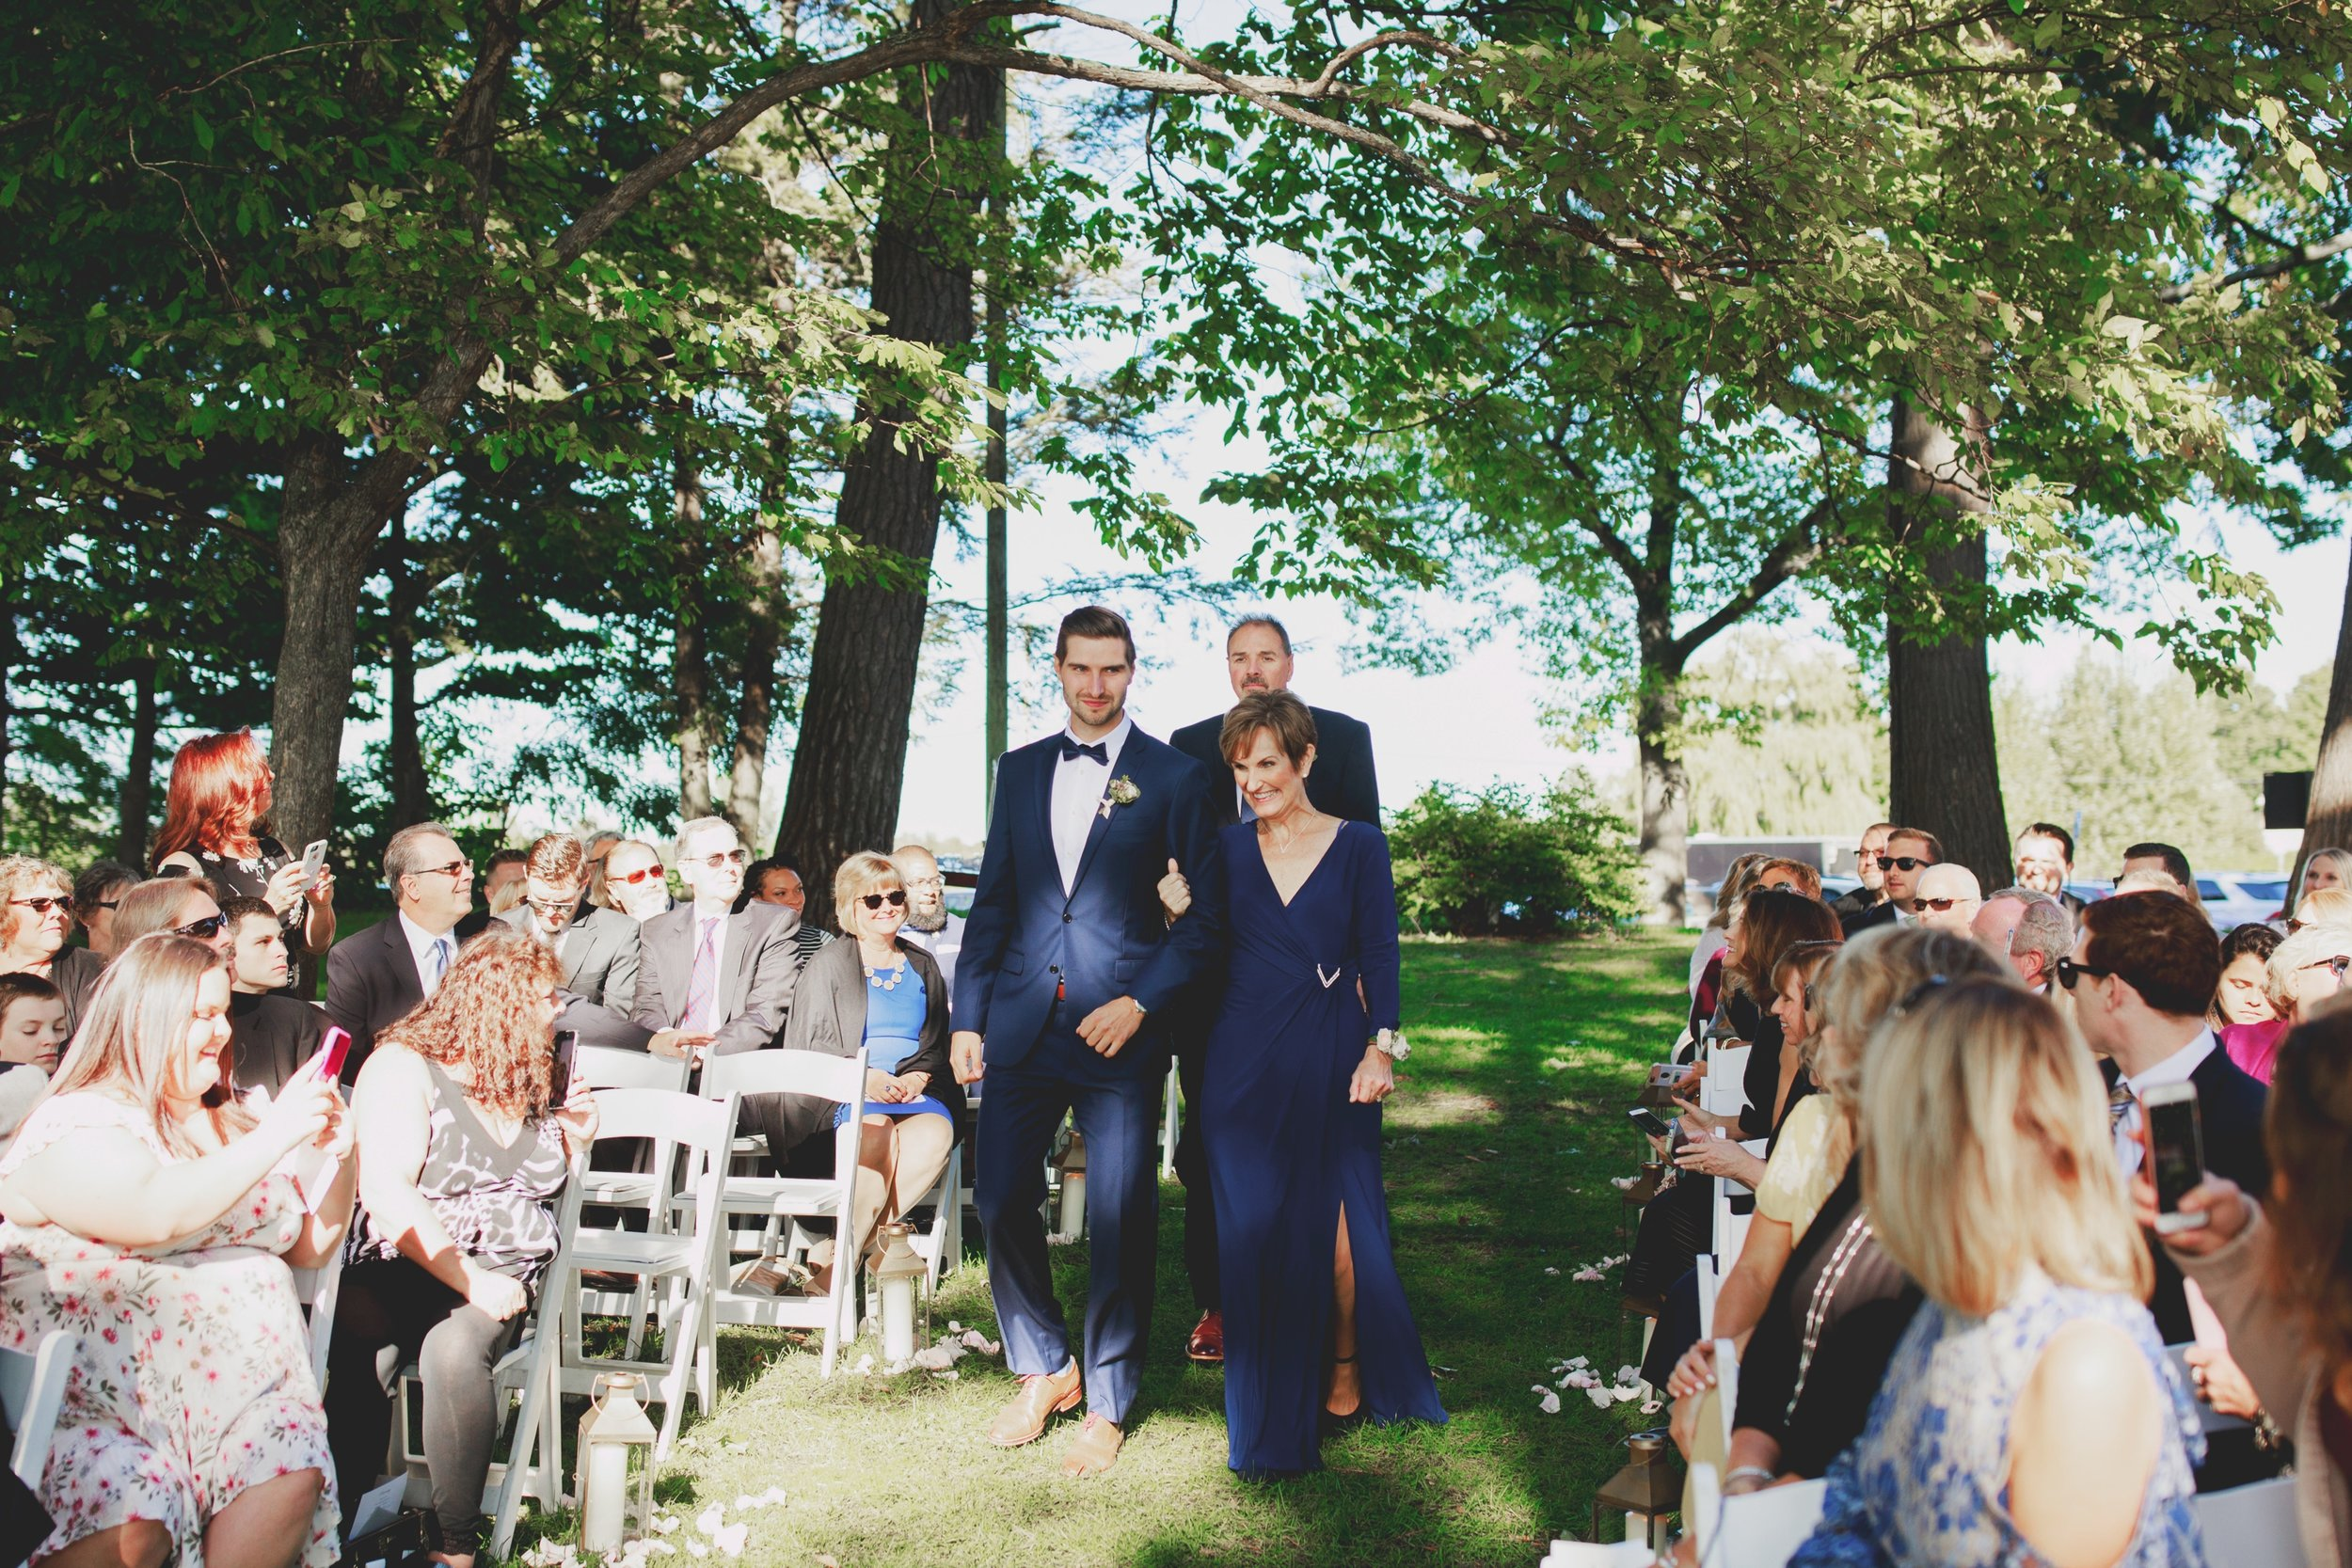 traverse_city_wedding_045.jpg